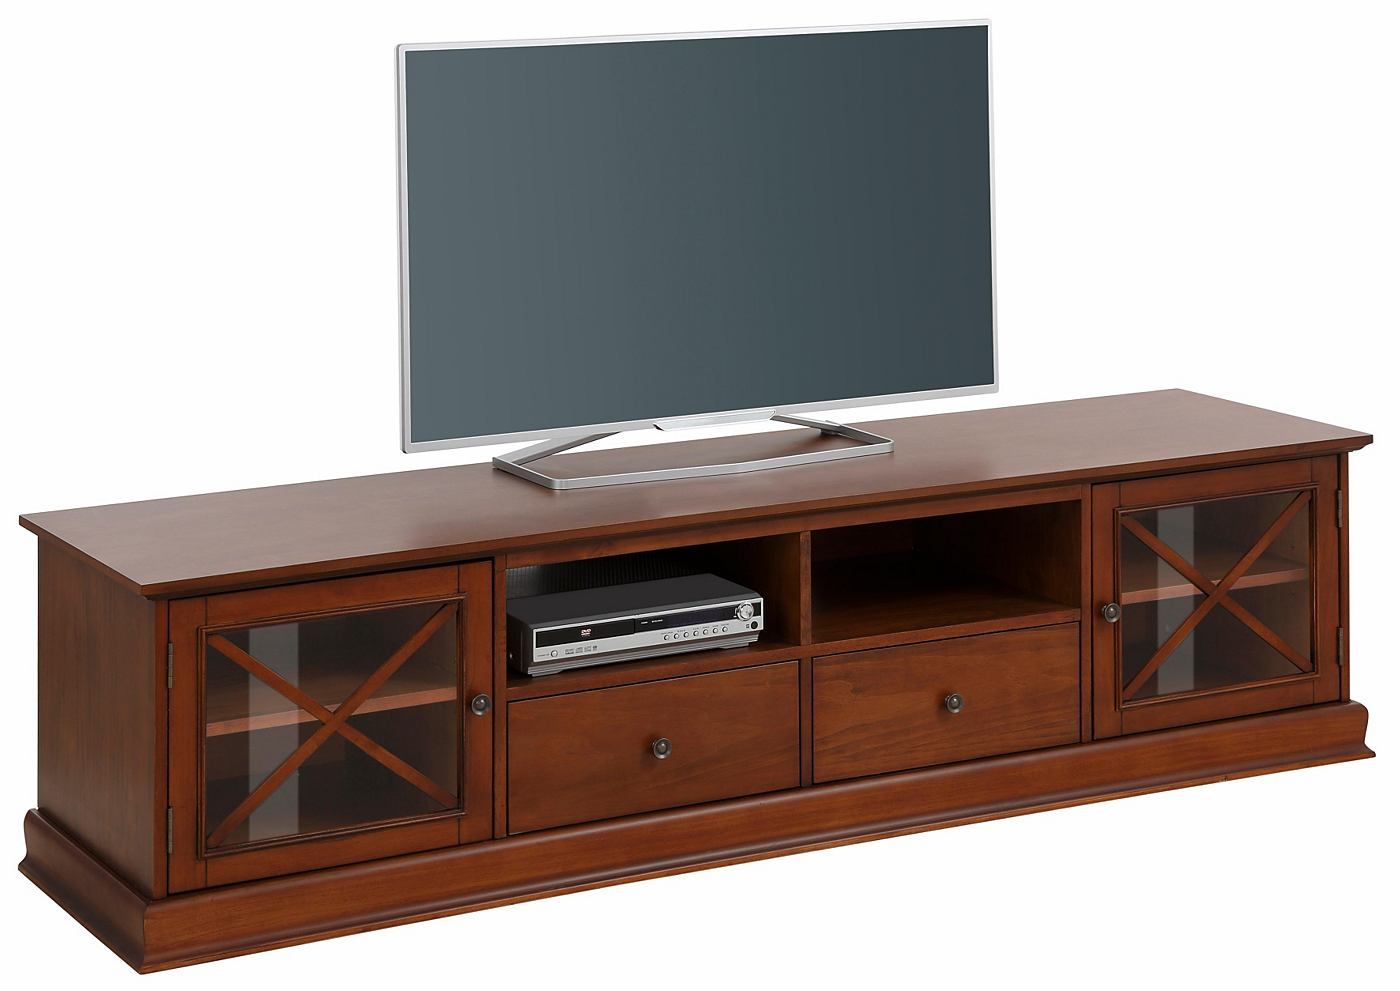 20 sparen tv lowboard cross von home affaire ab 399 99 cherry m bel otto. Black Bedroom Furniture Sets. Home Design Ideas